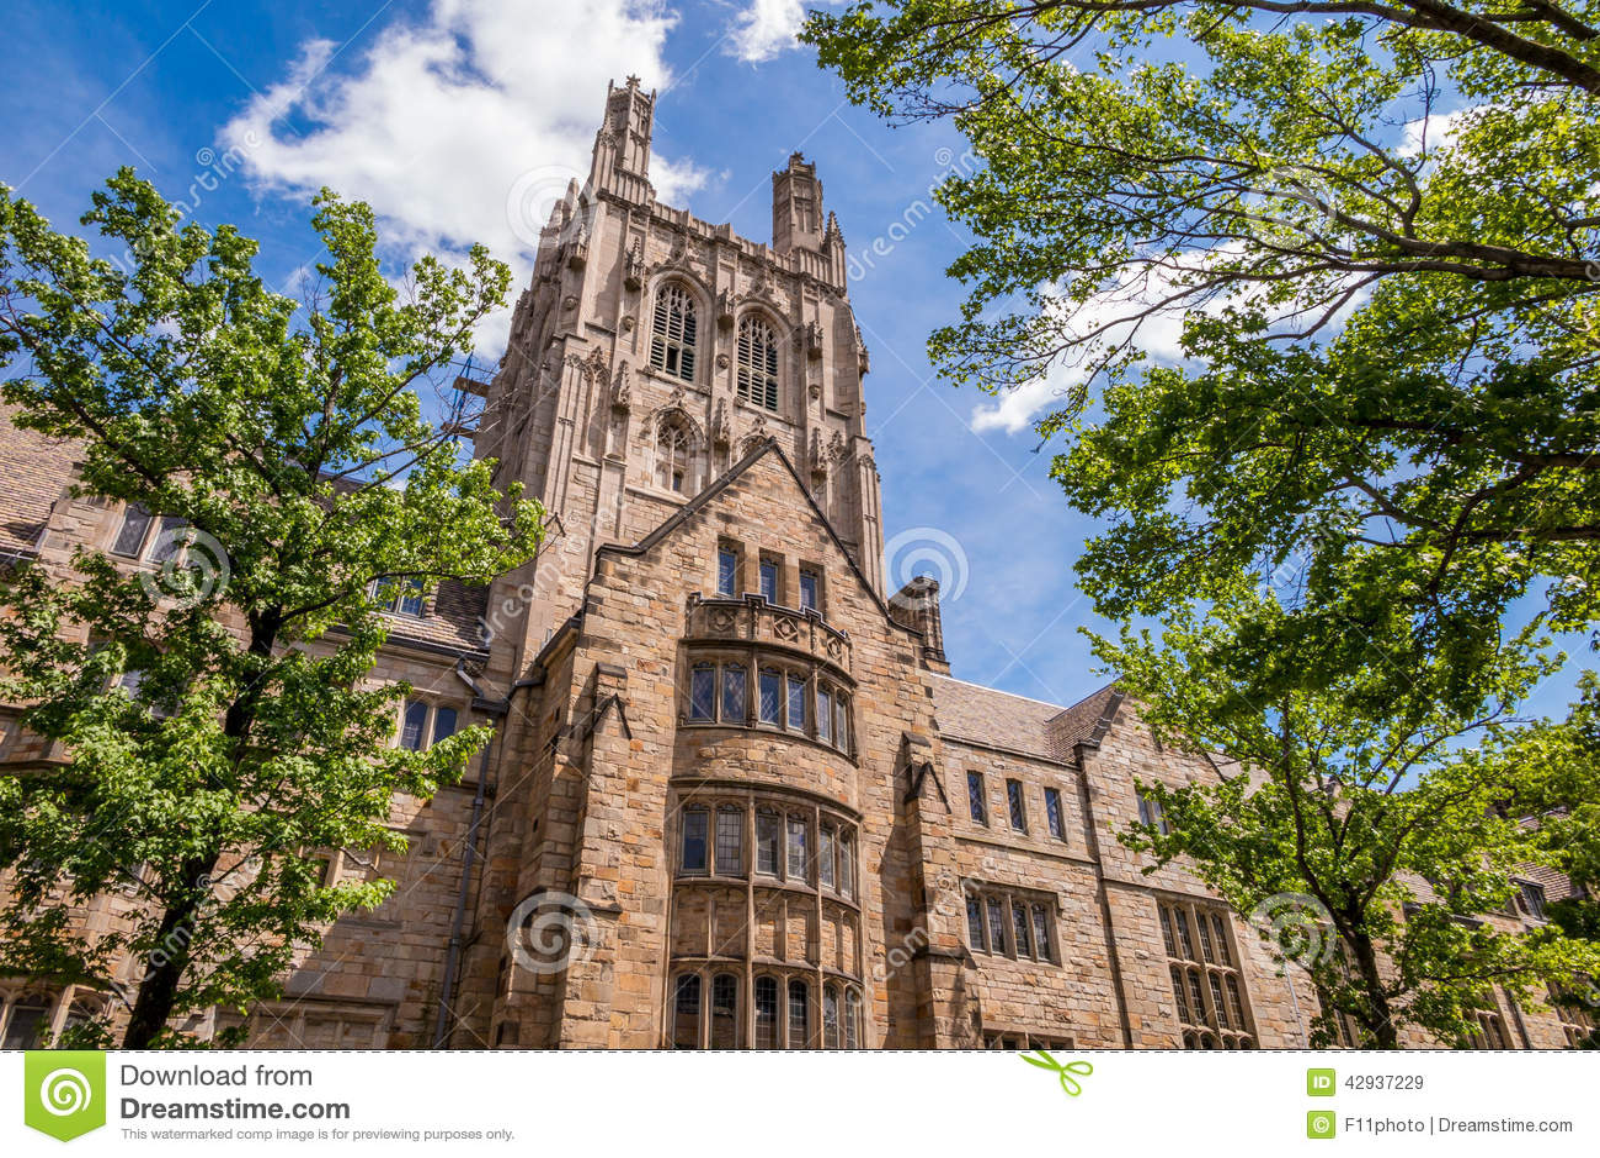 Yale universitaire gebouwen in de zomer blauwe hemel in New Haven, CT de V.S.